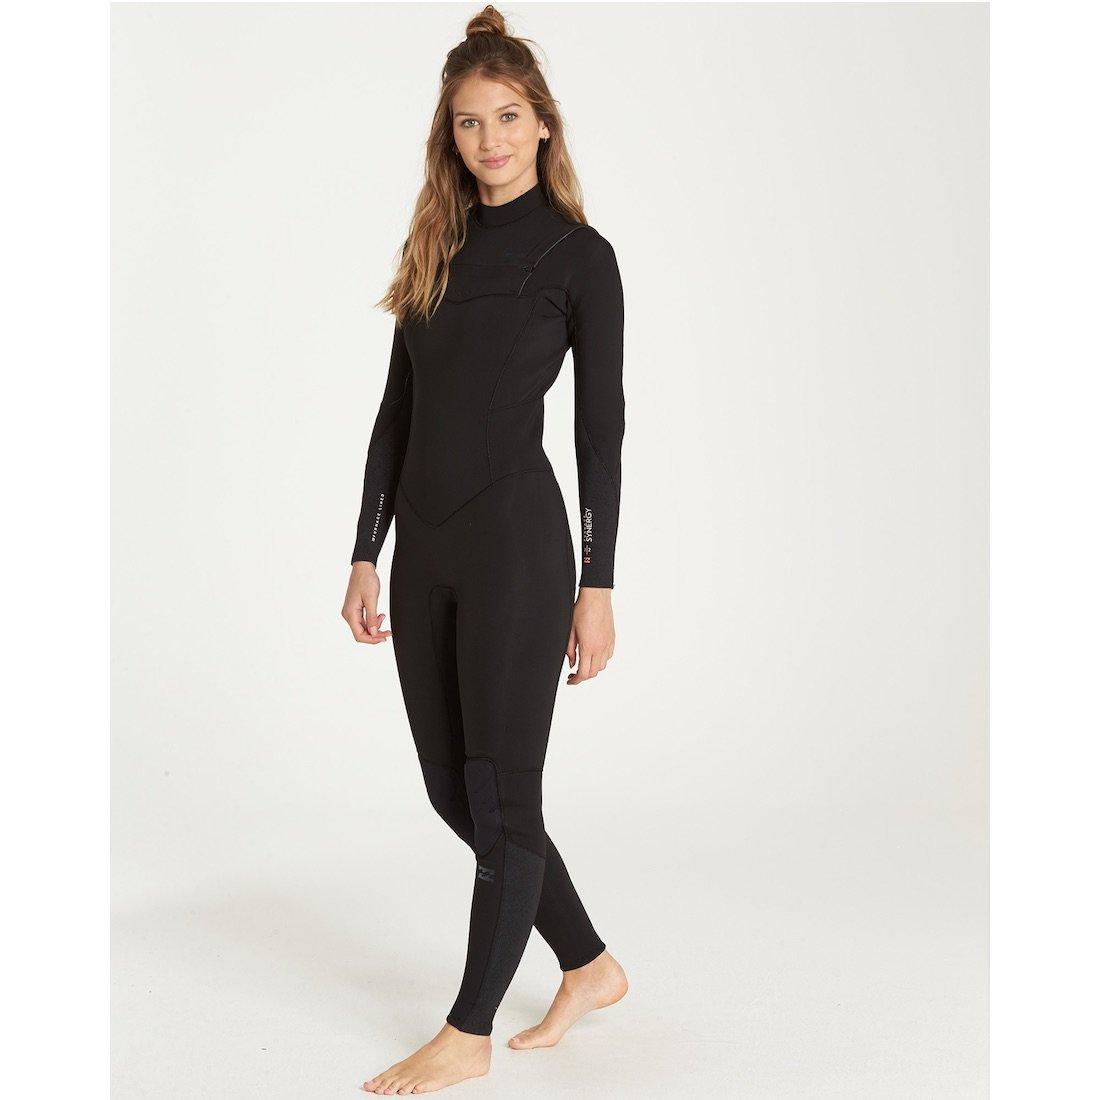 2f43ca3a63 billabong slate black chest zip Ladies womens girls winter wetsuit surf  surfing 5 4 5